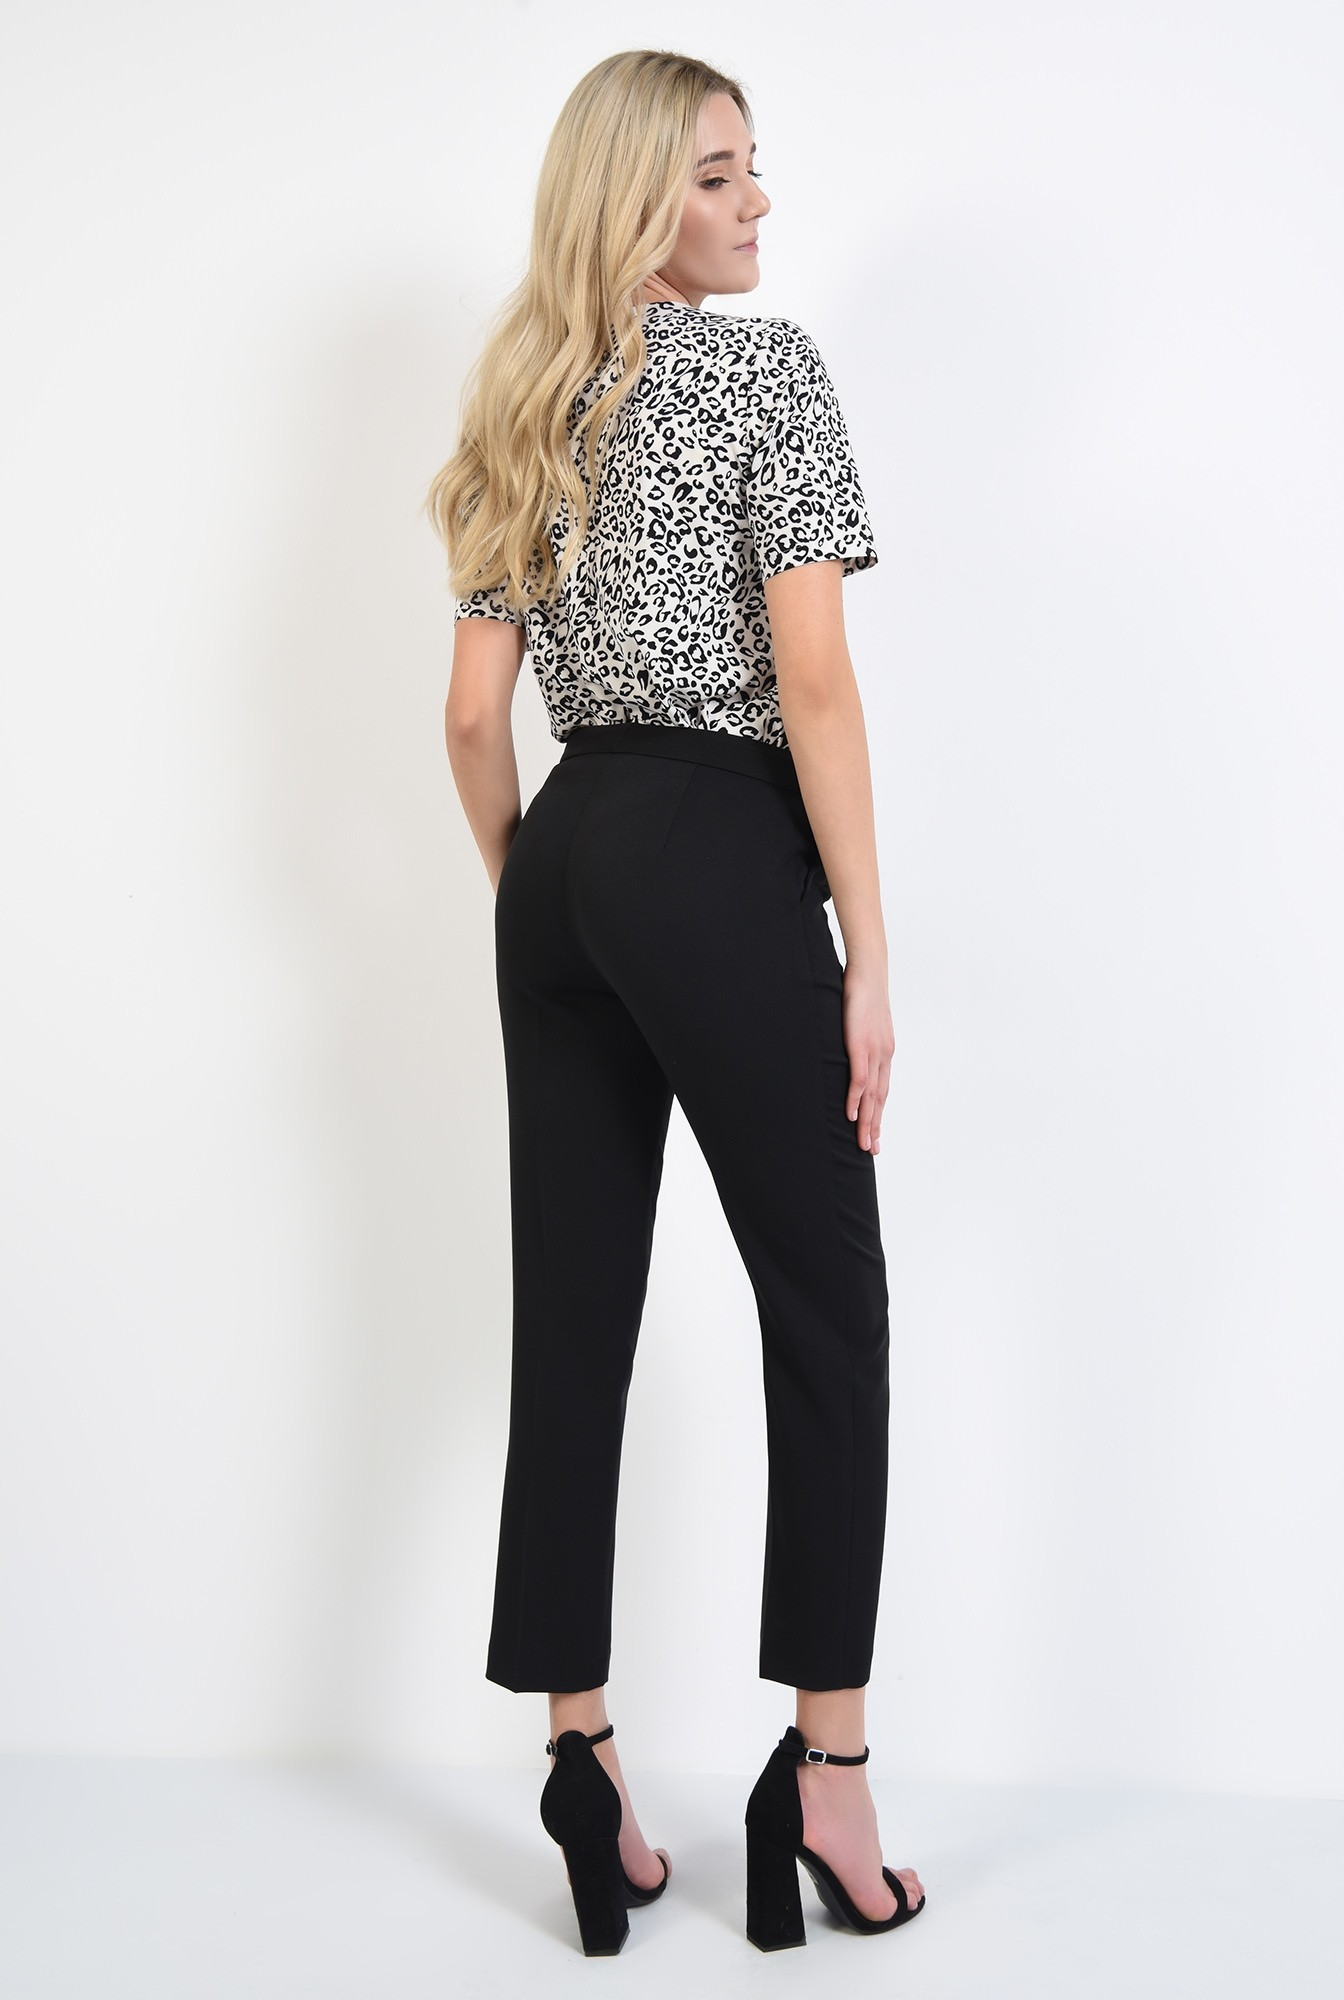 1 - pantaloni de zi, negri, lungi, croi tigareta